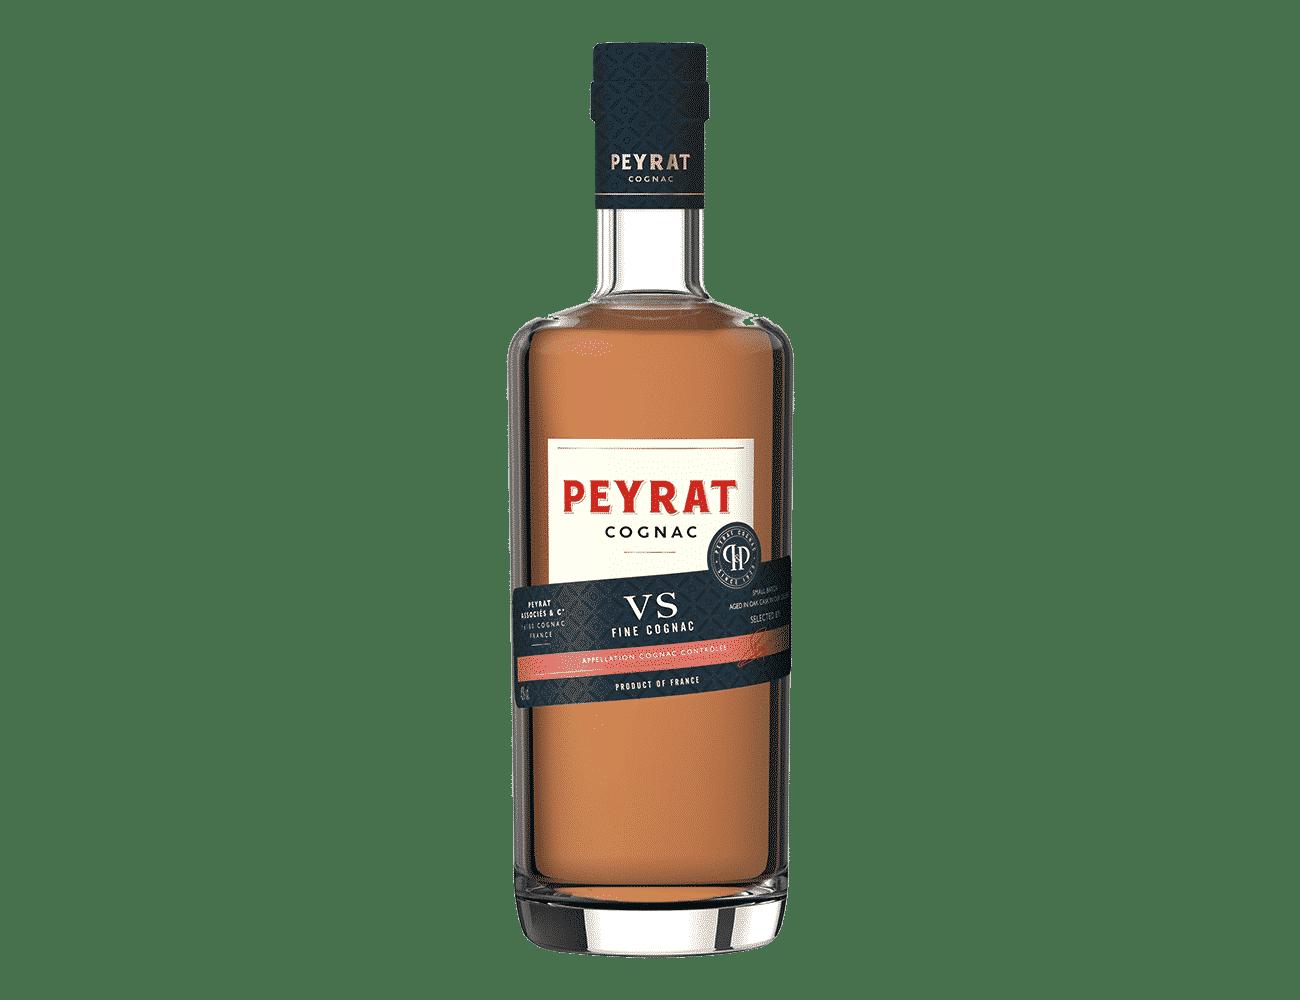 Peyrat4